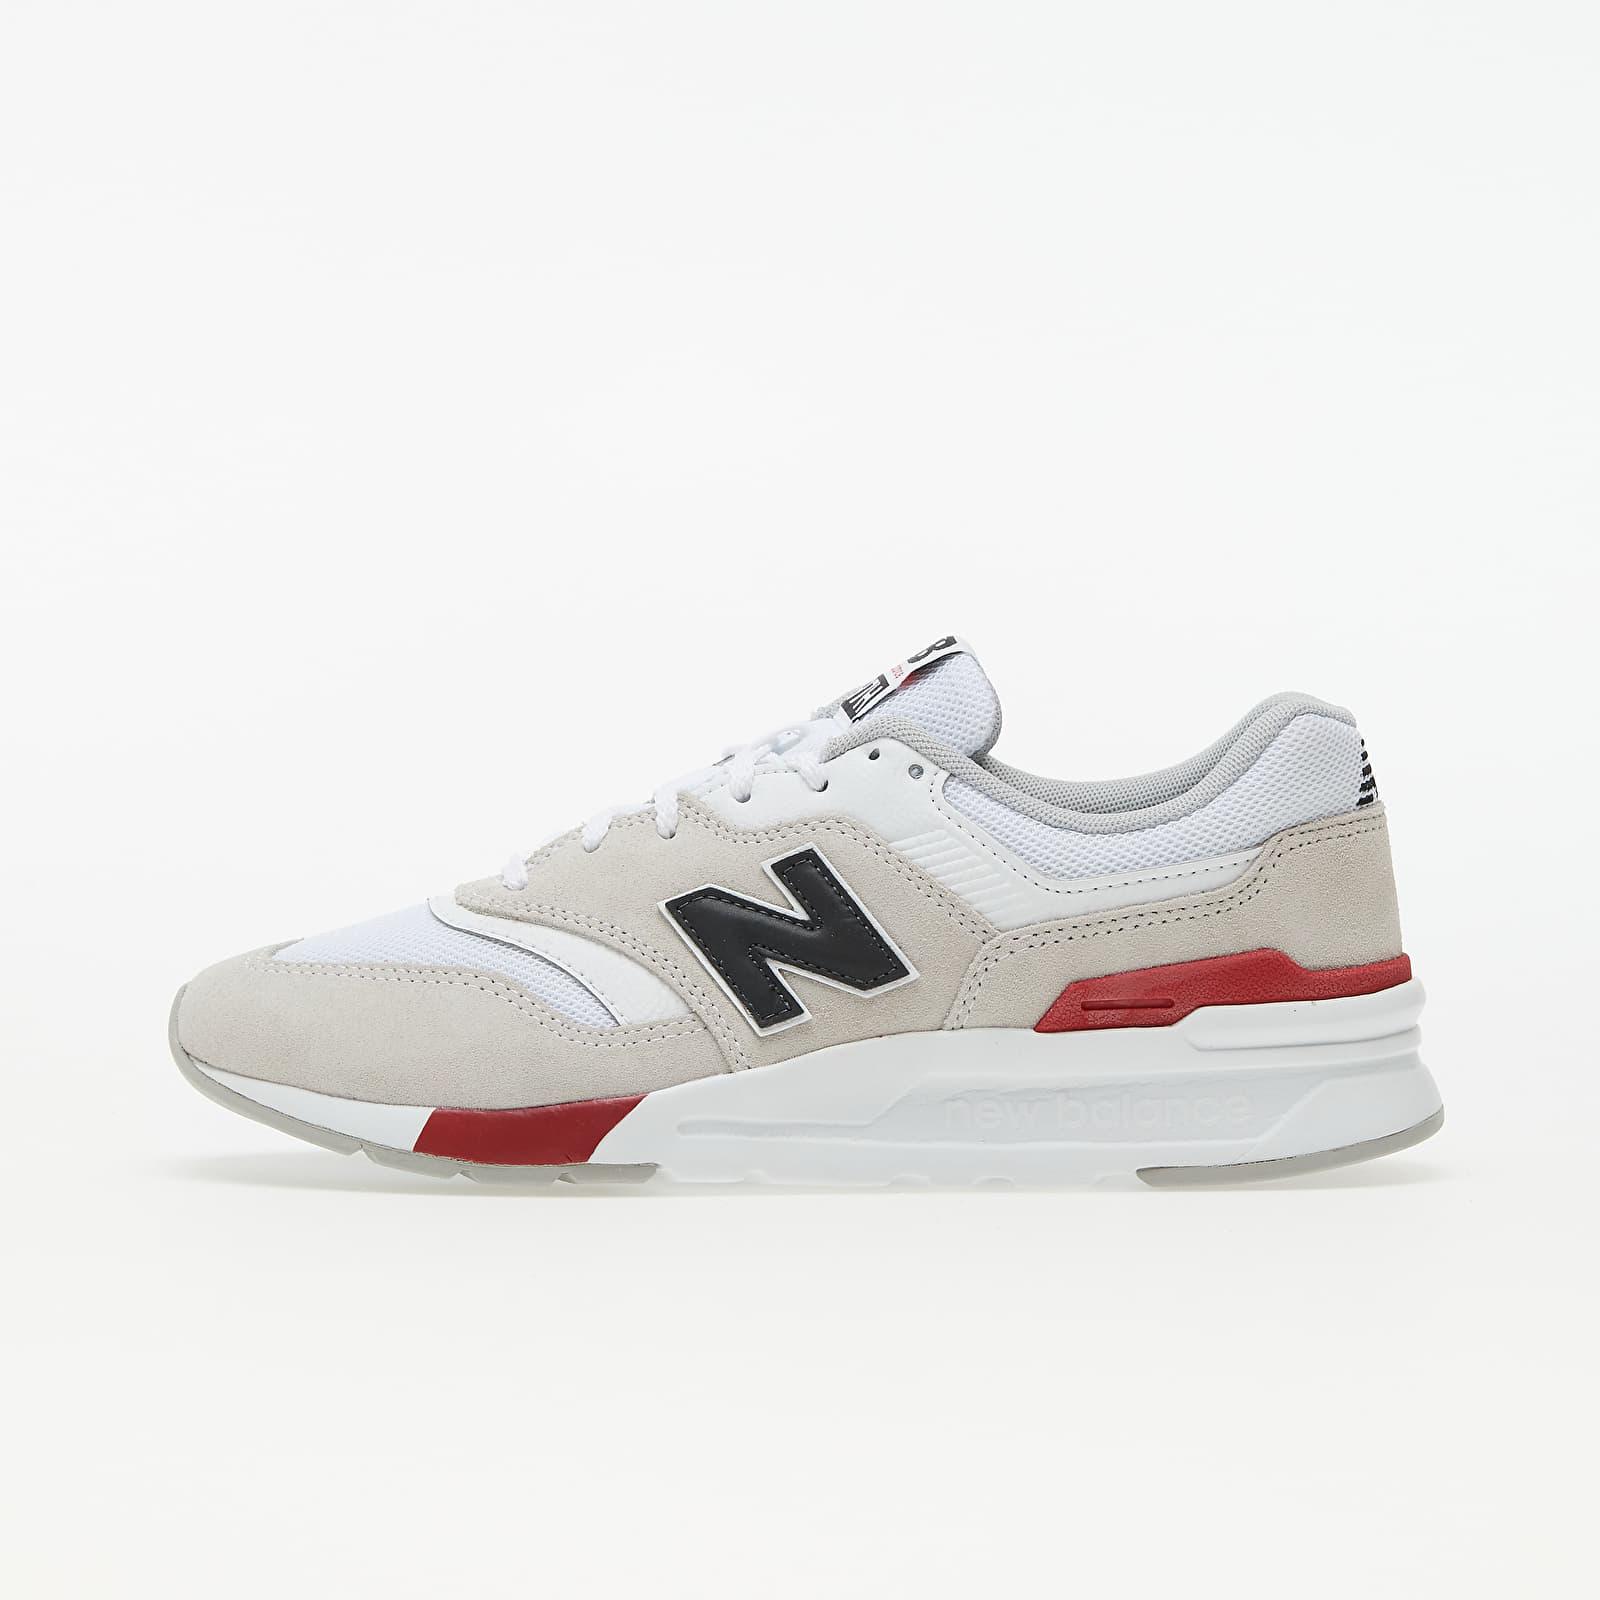 New Balance 997 Beige/ White EUR 41.5